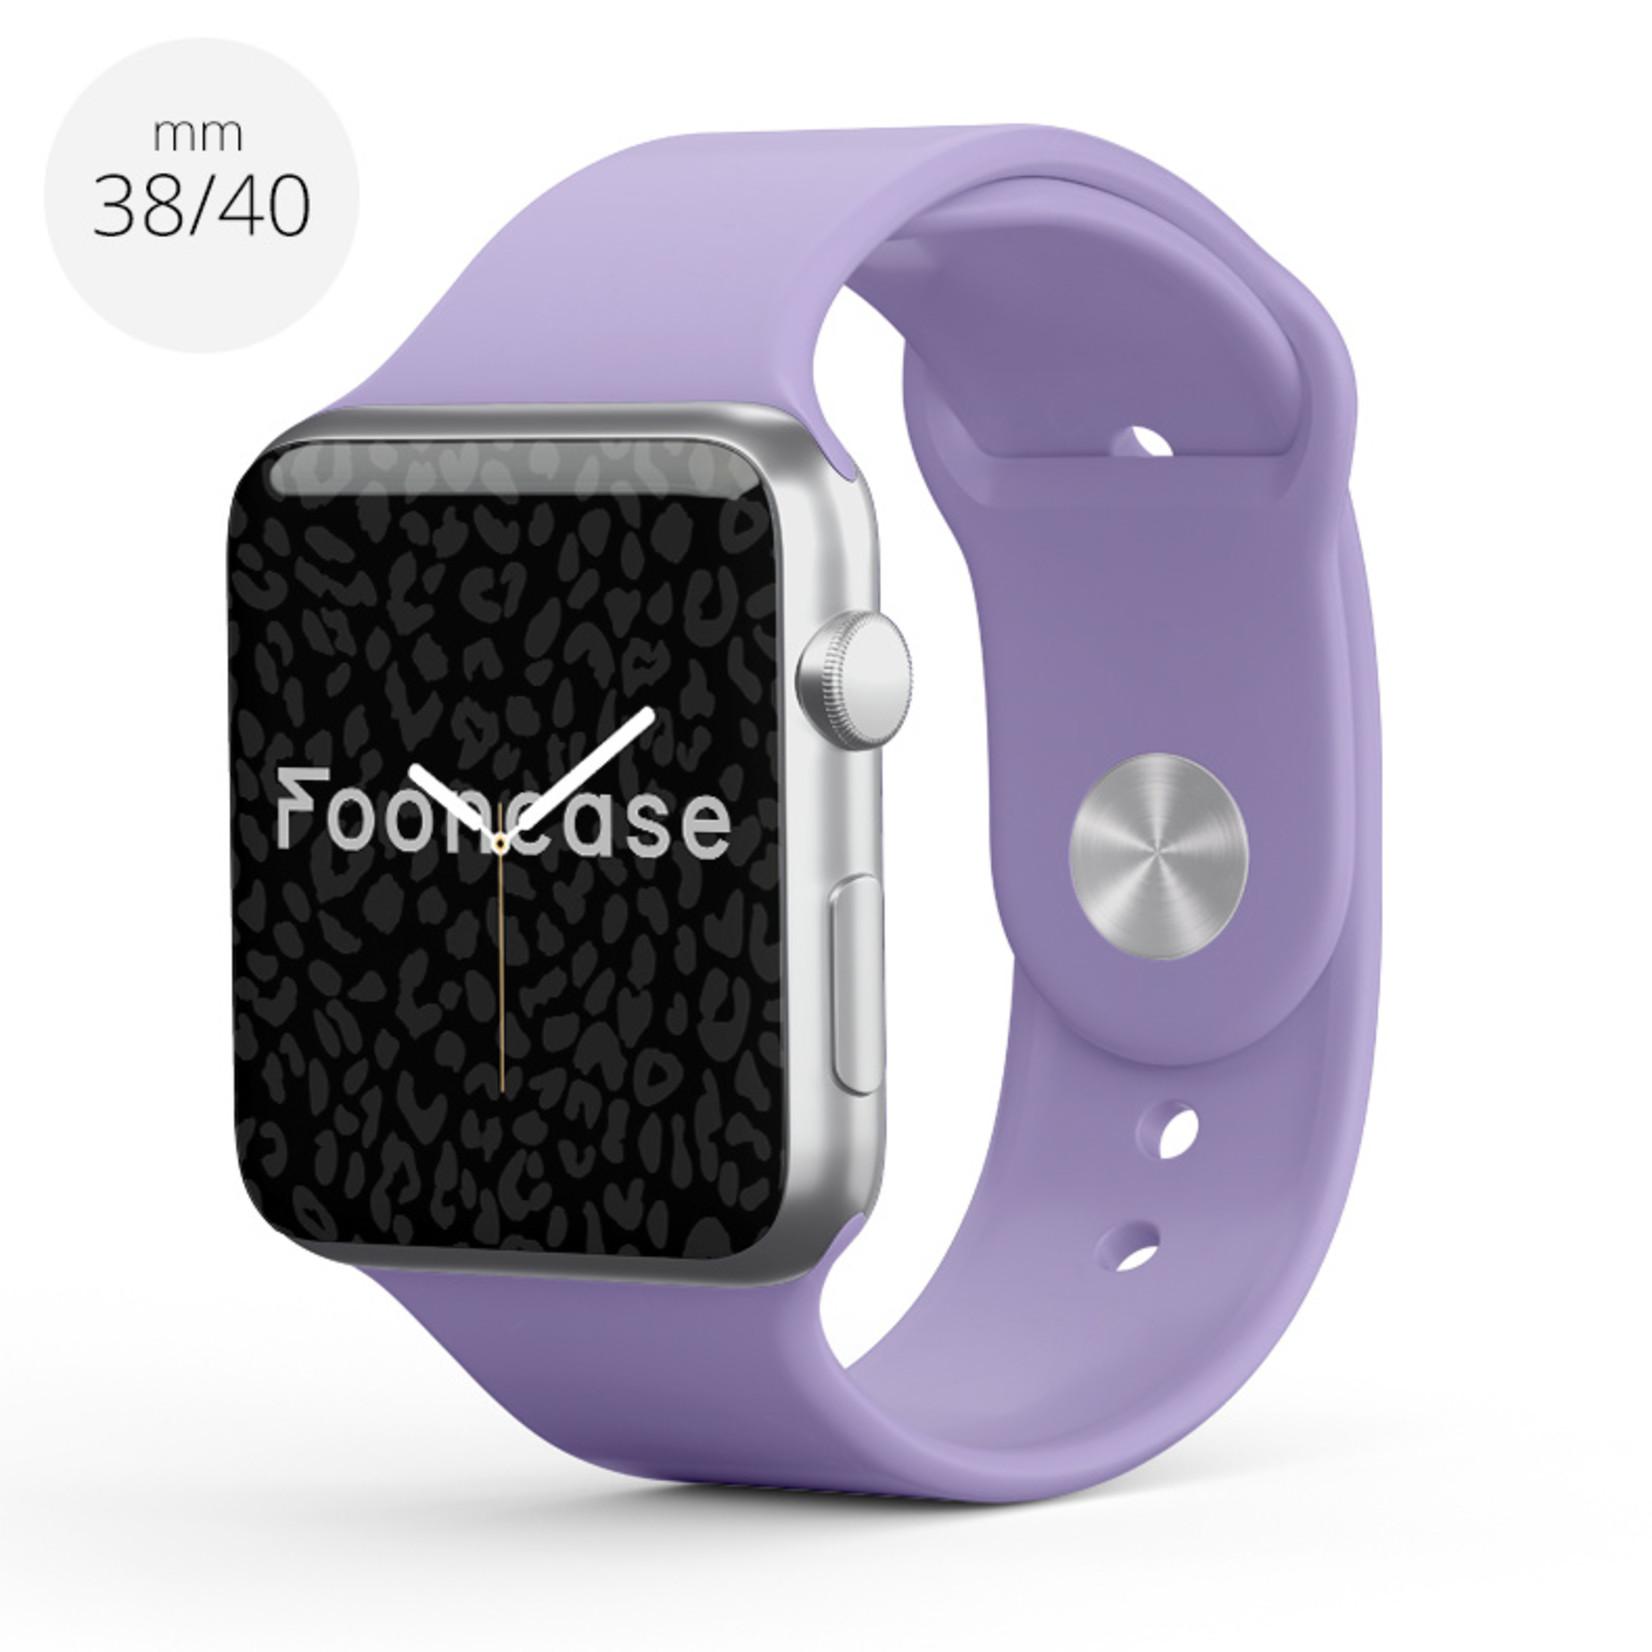 FOONCASE Apple Watch Series (1 t/m 6 / SE) - Pastelllila - 38/40mm